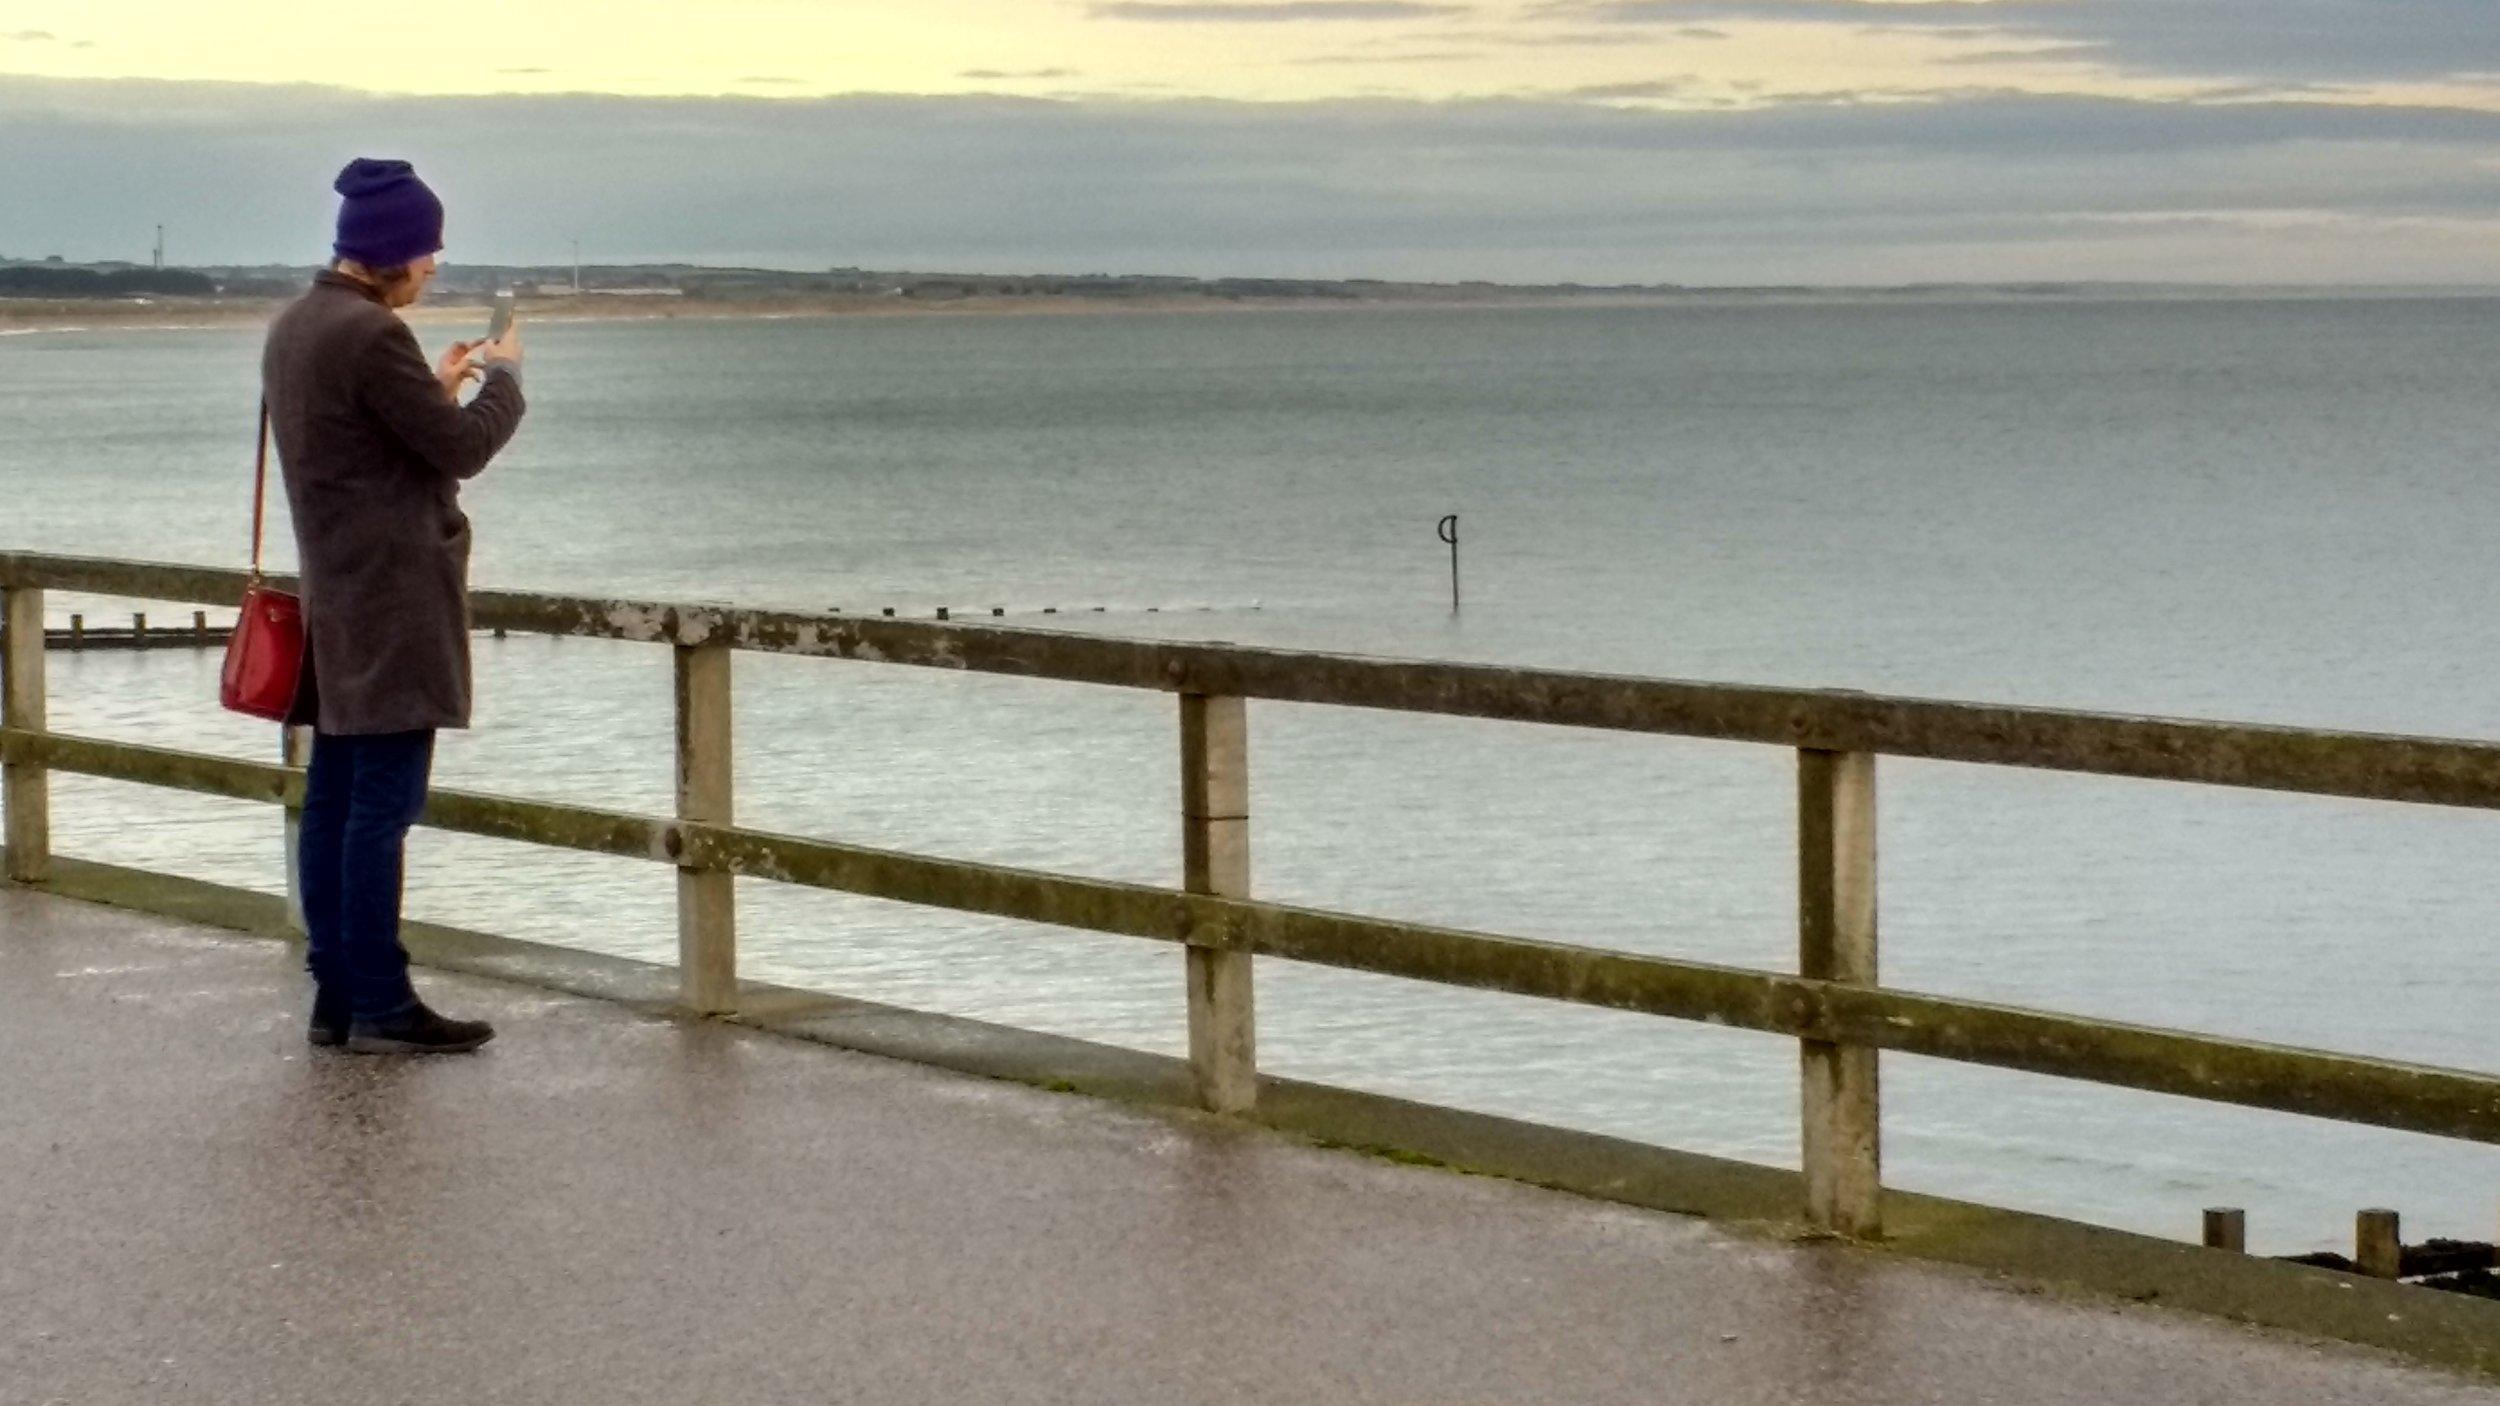 Aberdeen Beach Promenade